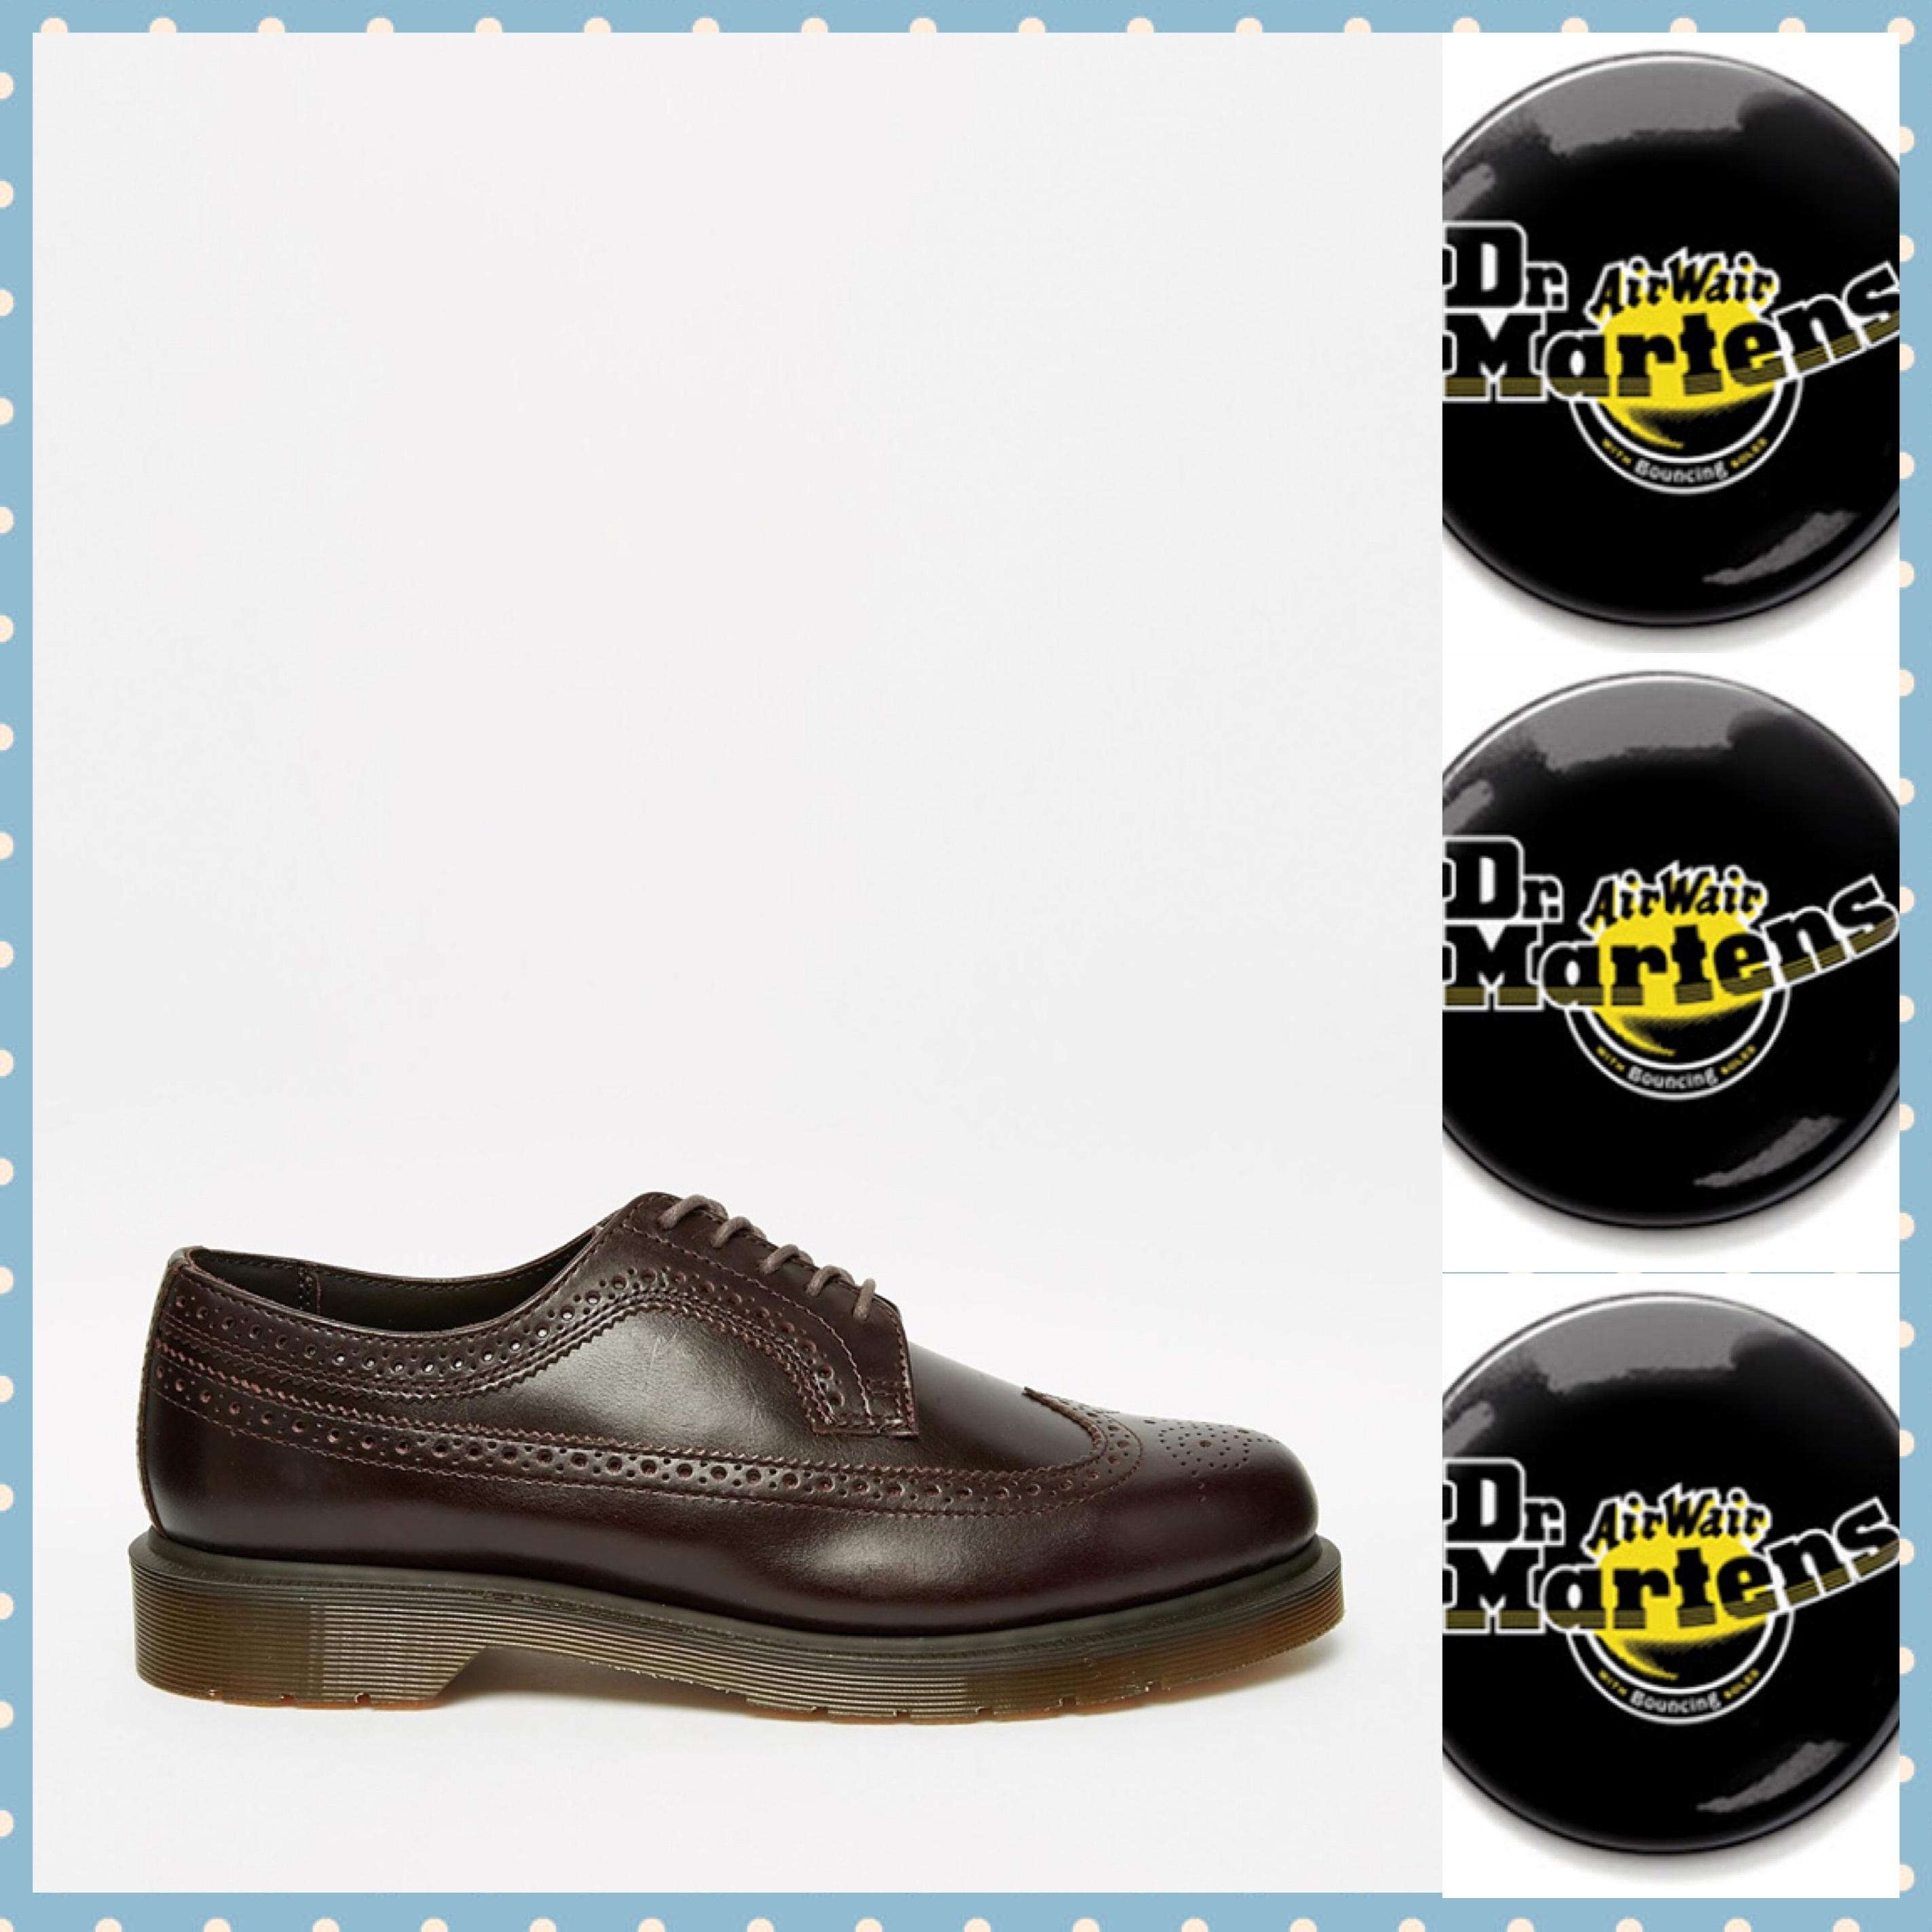 popular dr martens 3989 brogues dress shoes buyma